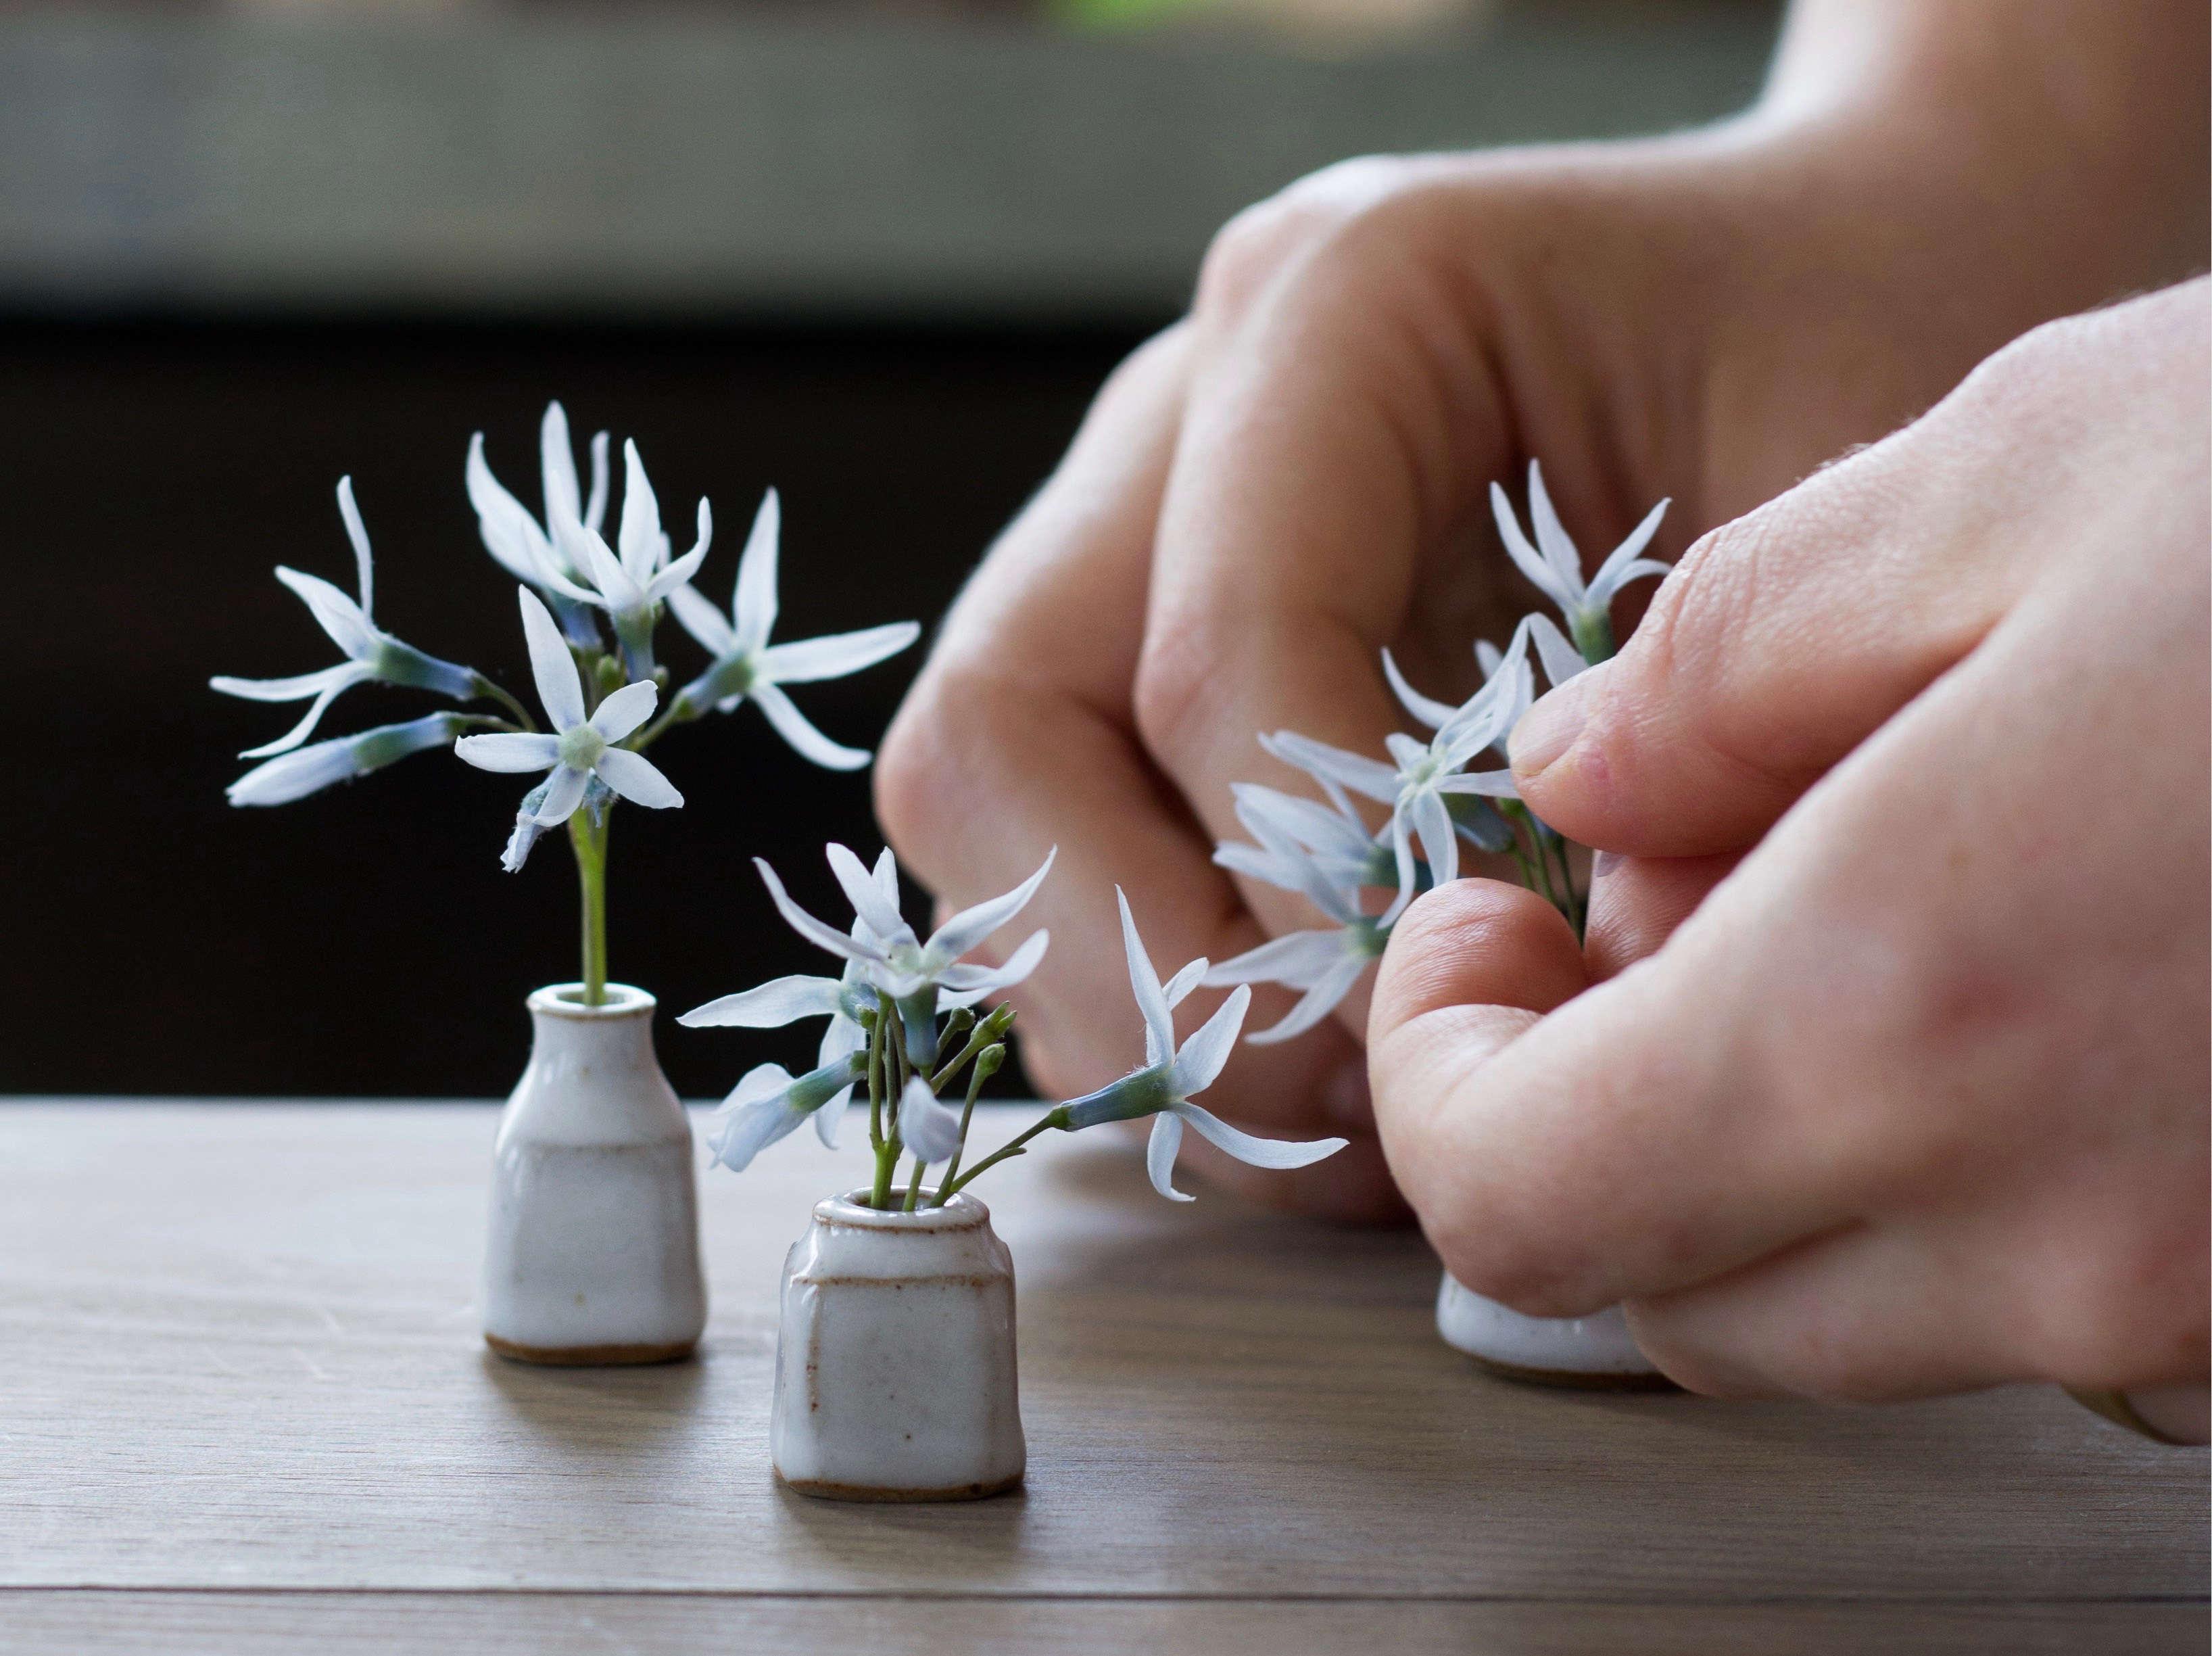 Tiny Bouquets 8 Ideas For Floral Arrangements In Miniature Vases